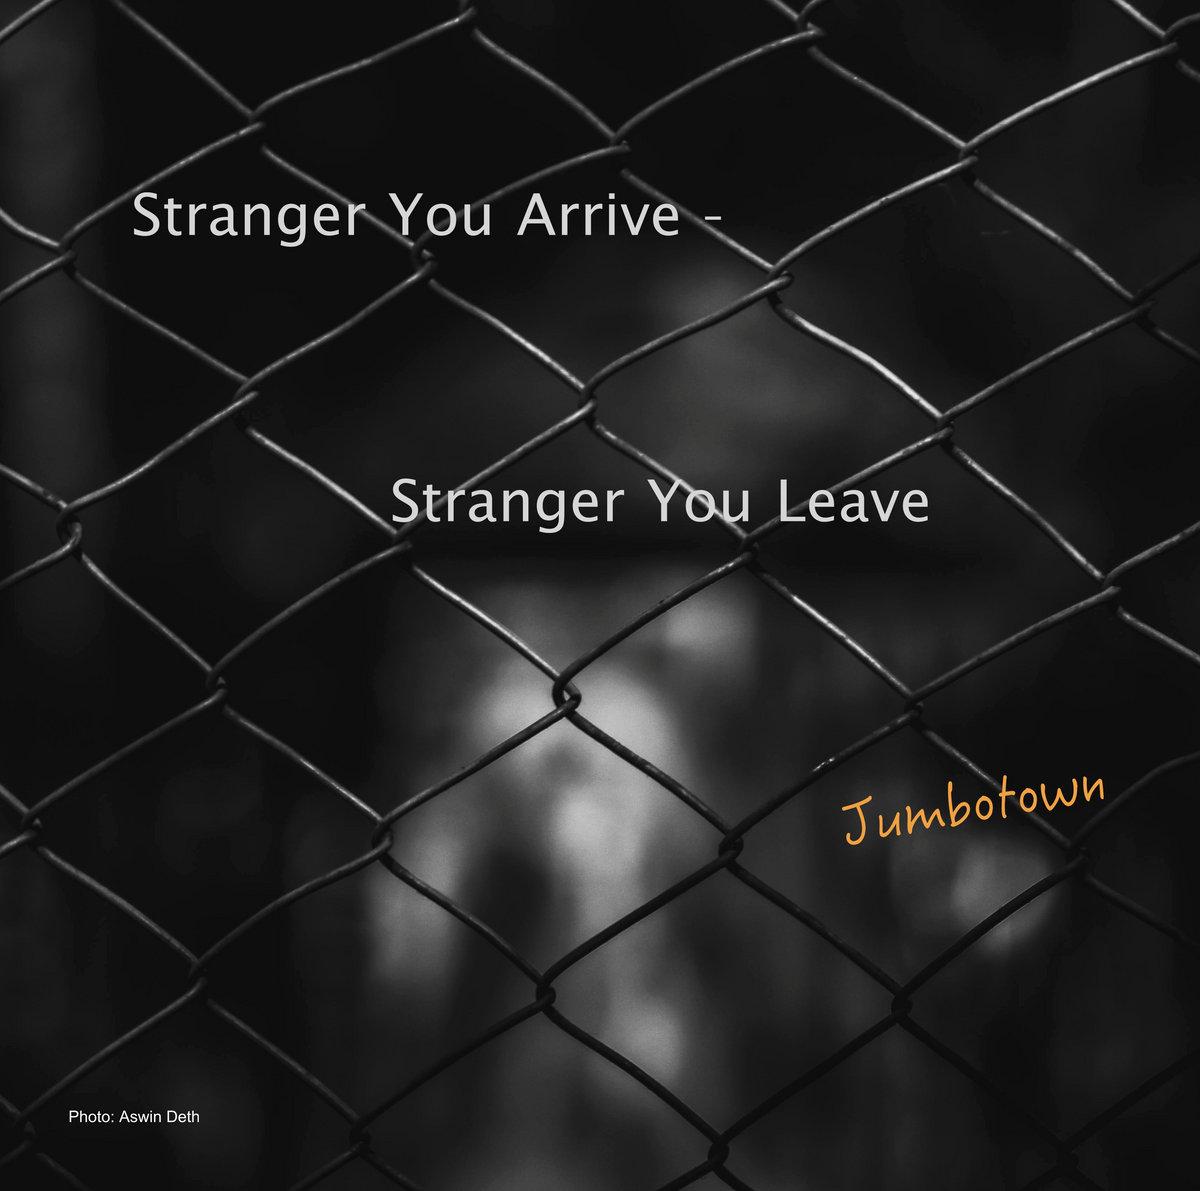 Stranger You Arrive - Stranger You Leave by Jumbotown